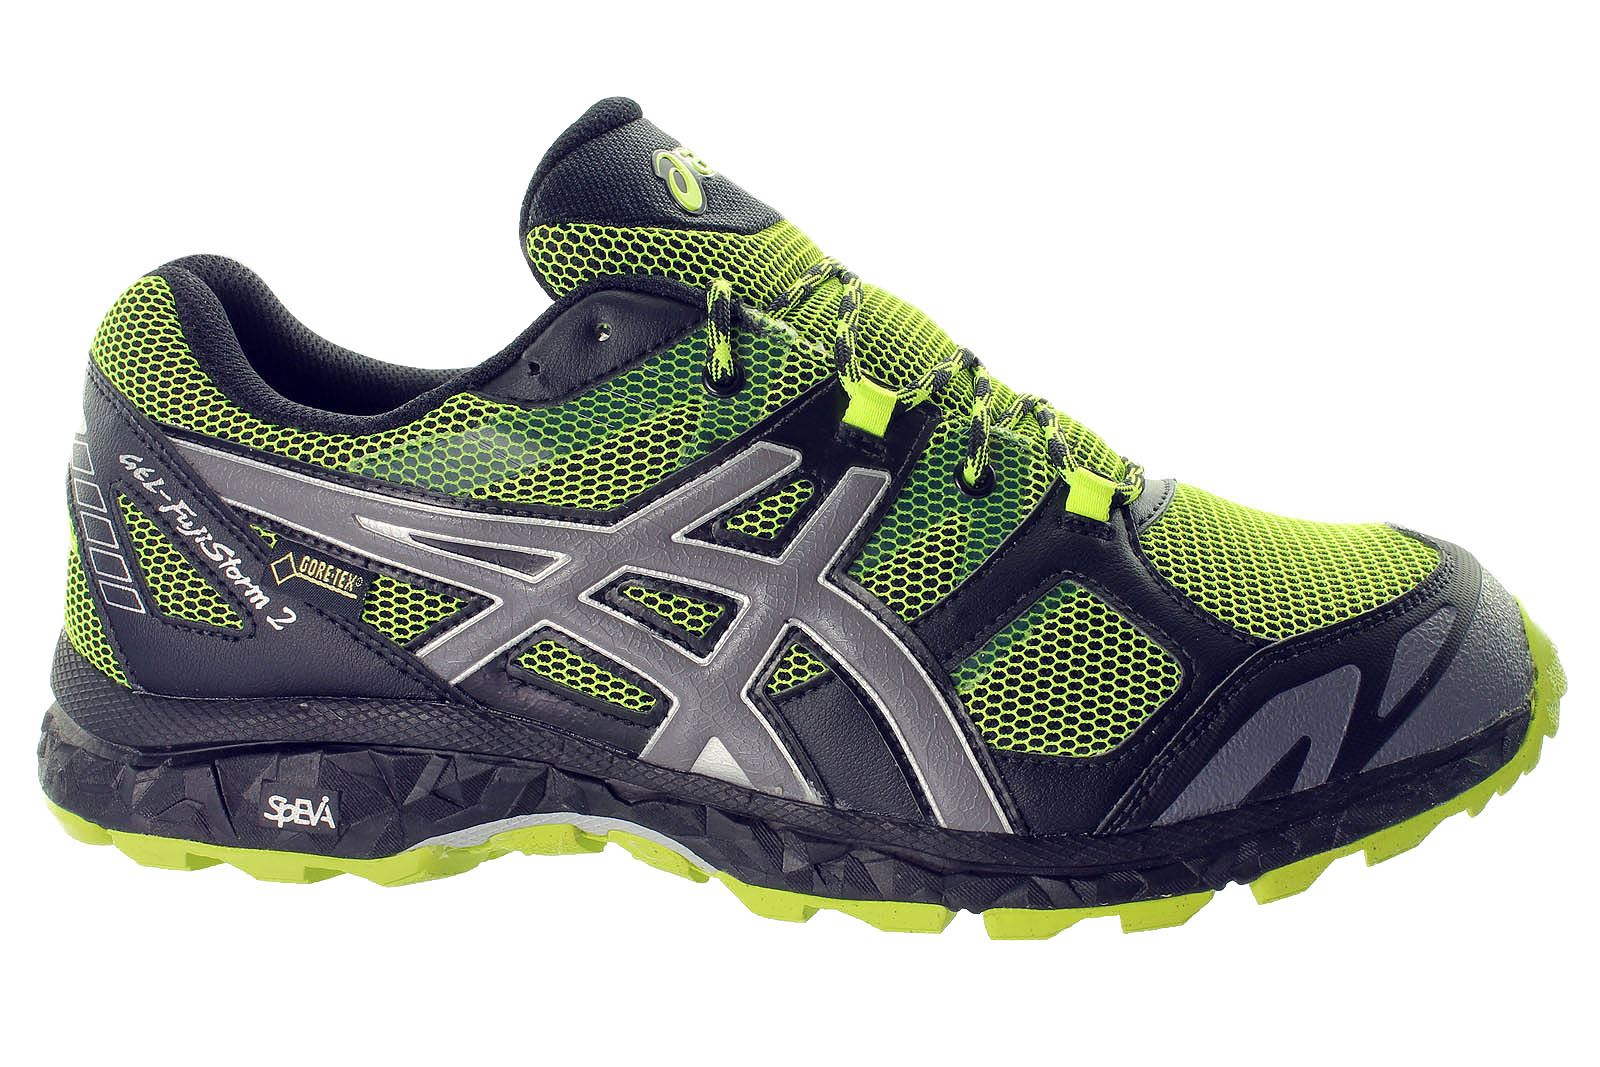 Gor Tex Trail Running Shoes Mens